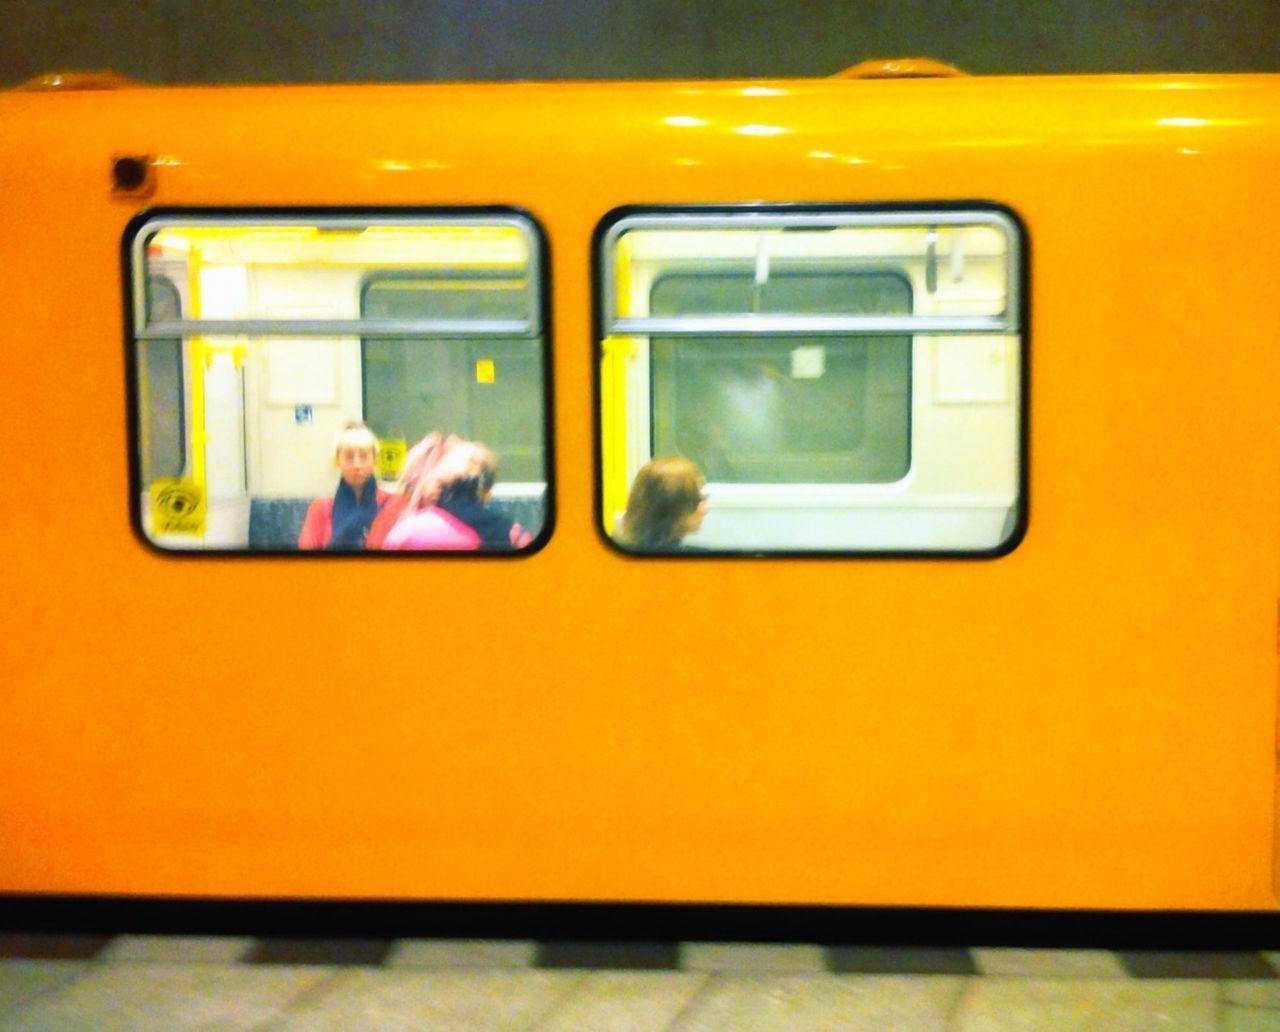 TRAIN PASSING THROUGH TRAIN